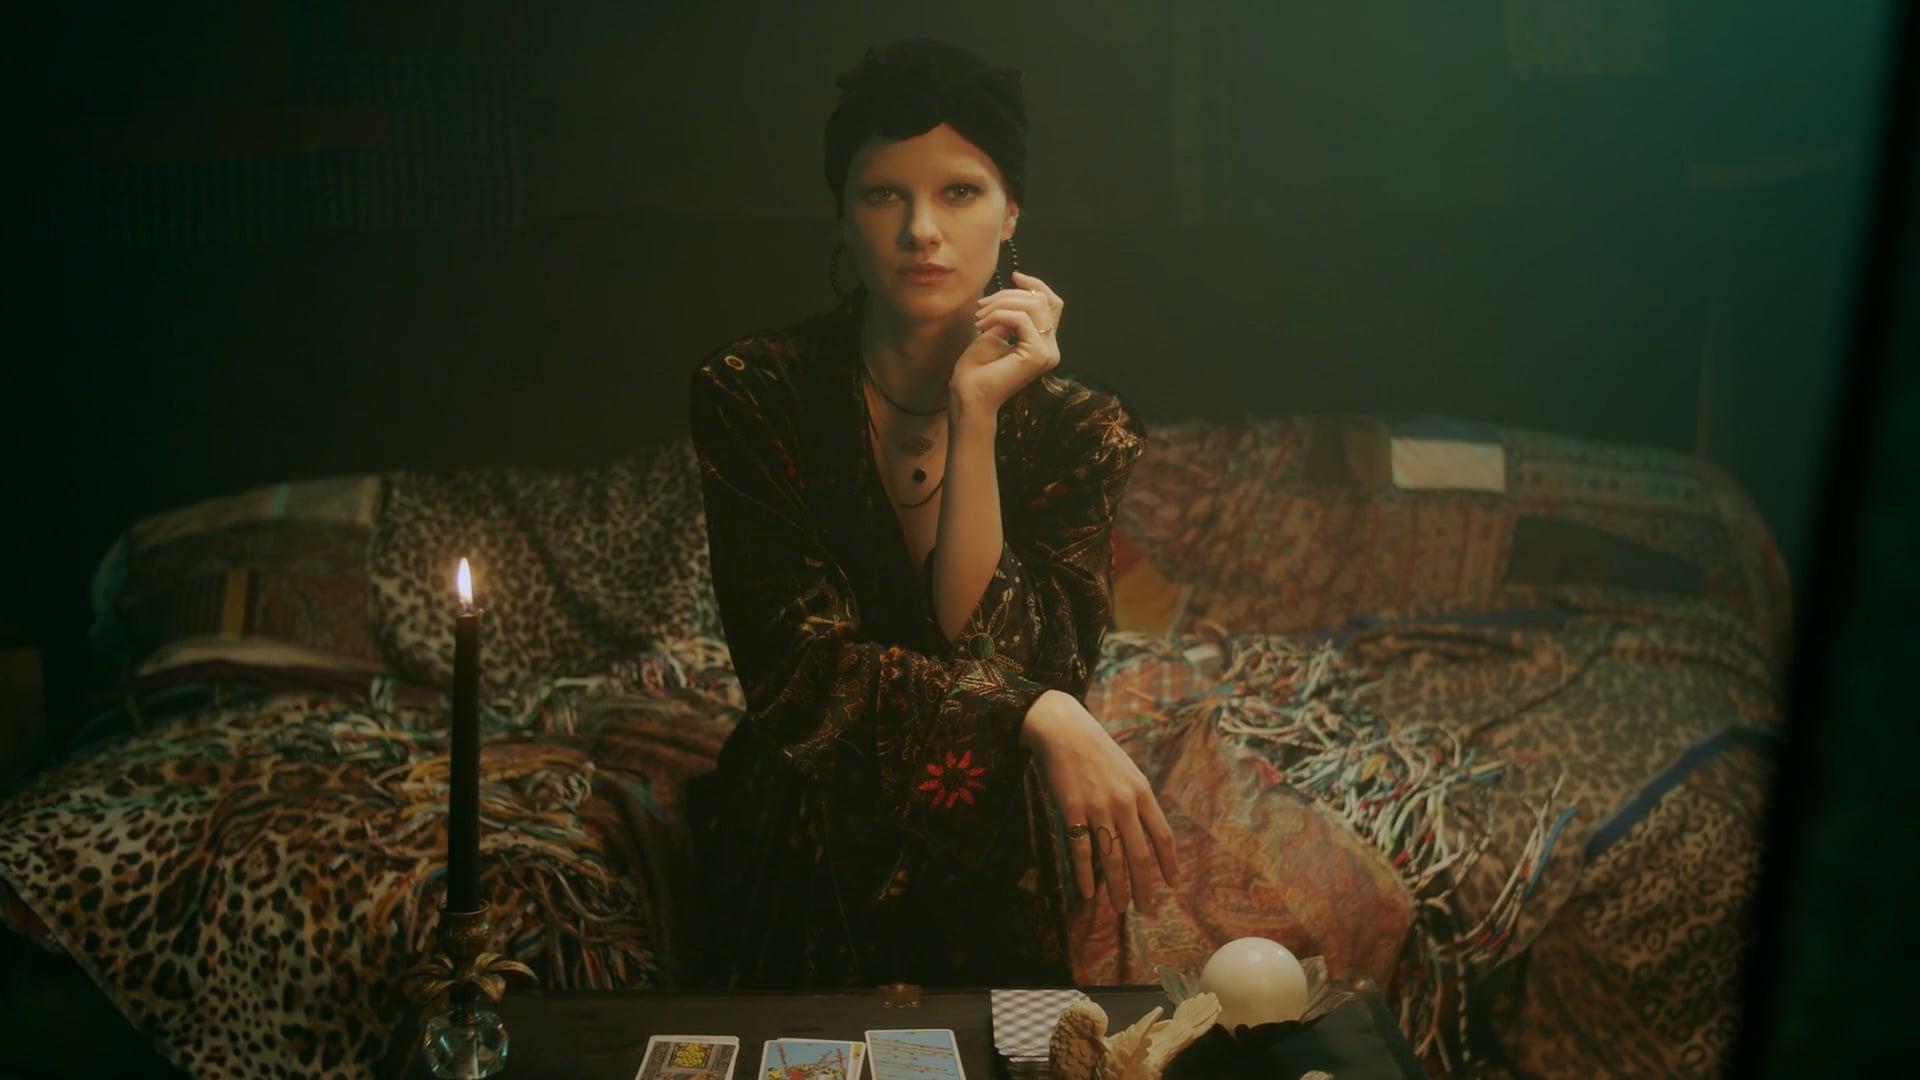 GINETTE NY - AJNA #1- The fortune teller instamovie